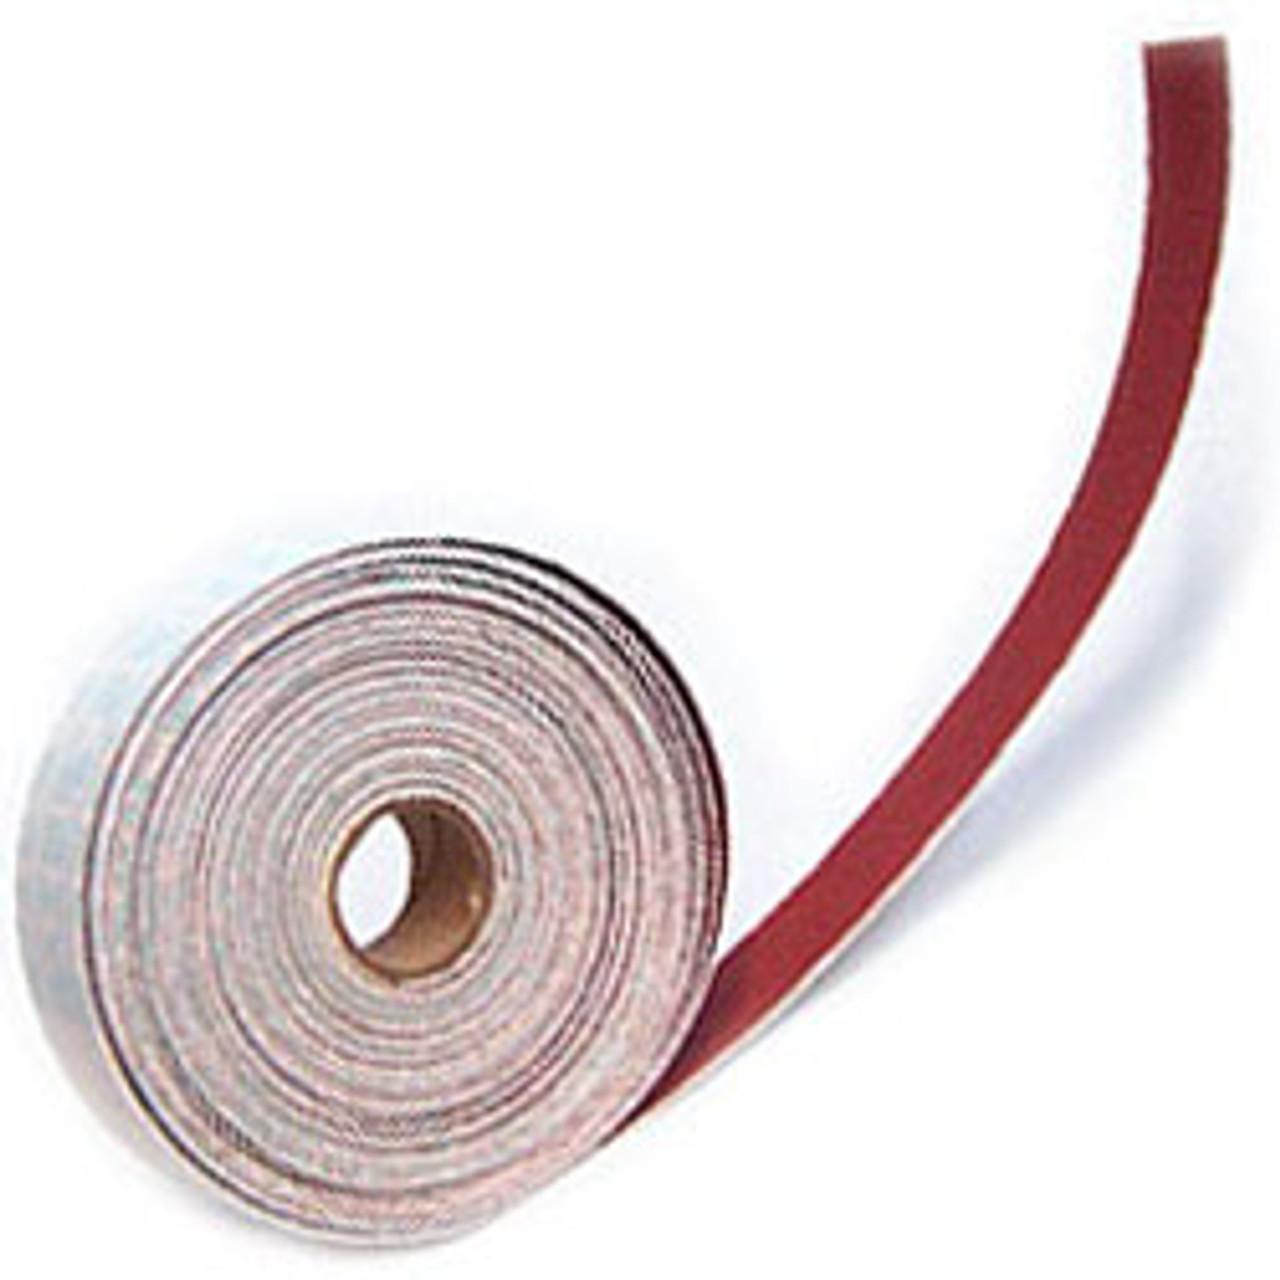 "Klingspor Abrasives Heavyweight Aluminum Oxide, 1-1/8"" Wide X 10 Meter (32Ft) Long, 80 Grit, Hook & Loop Rolls"